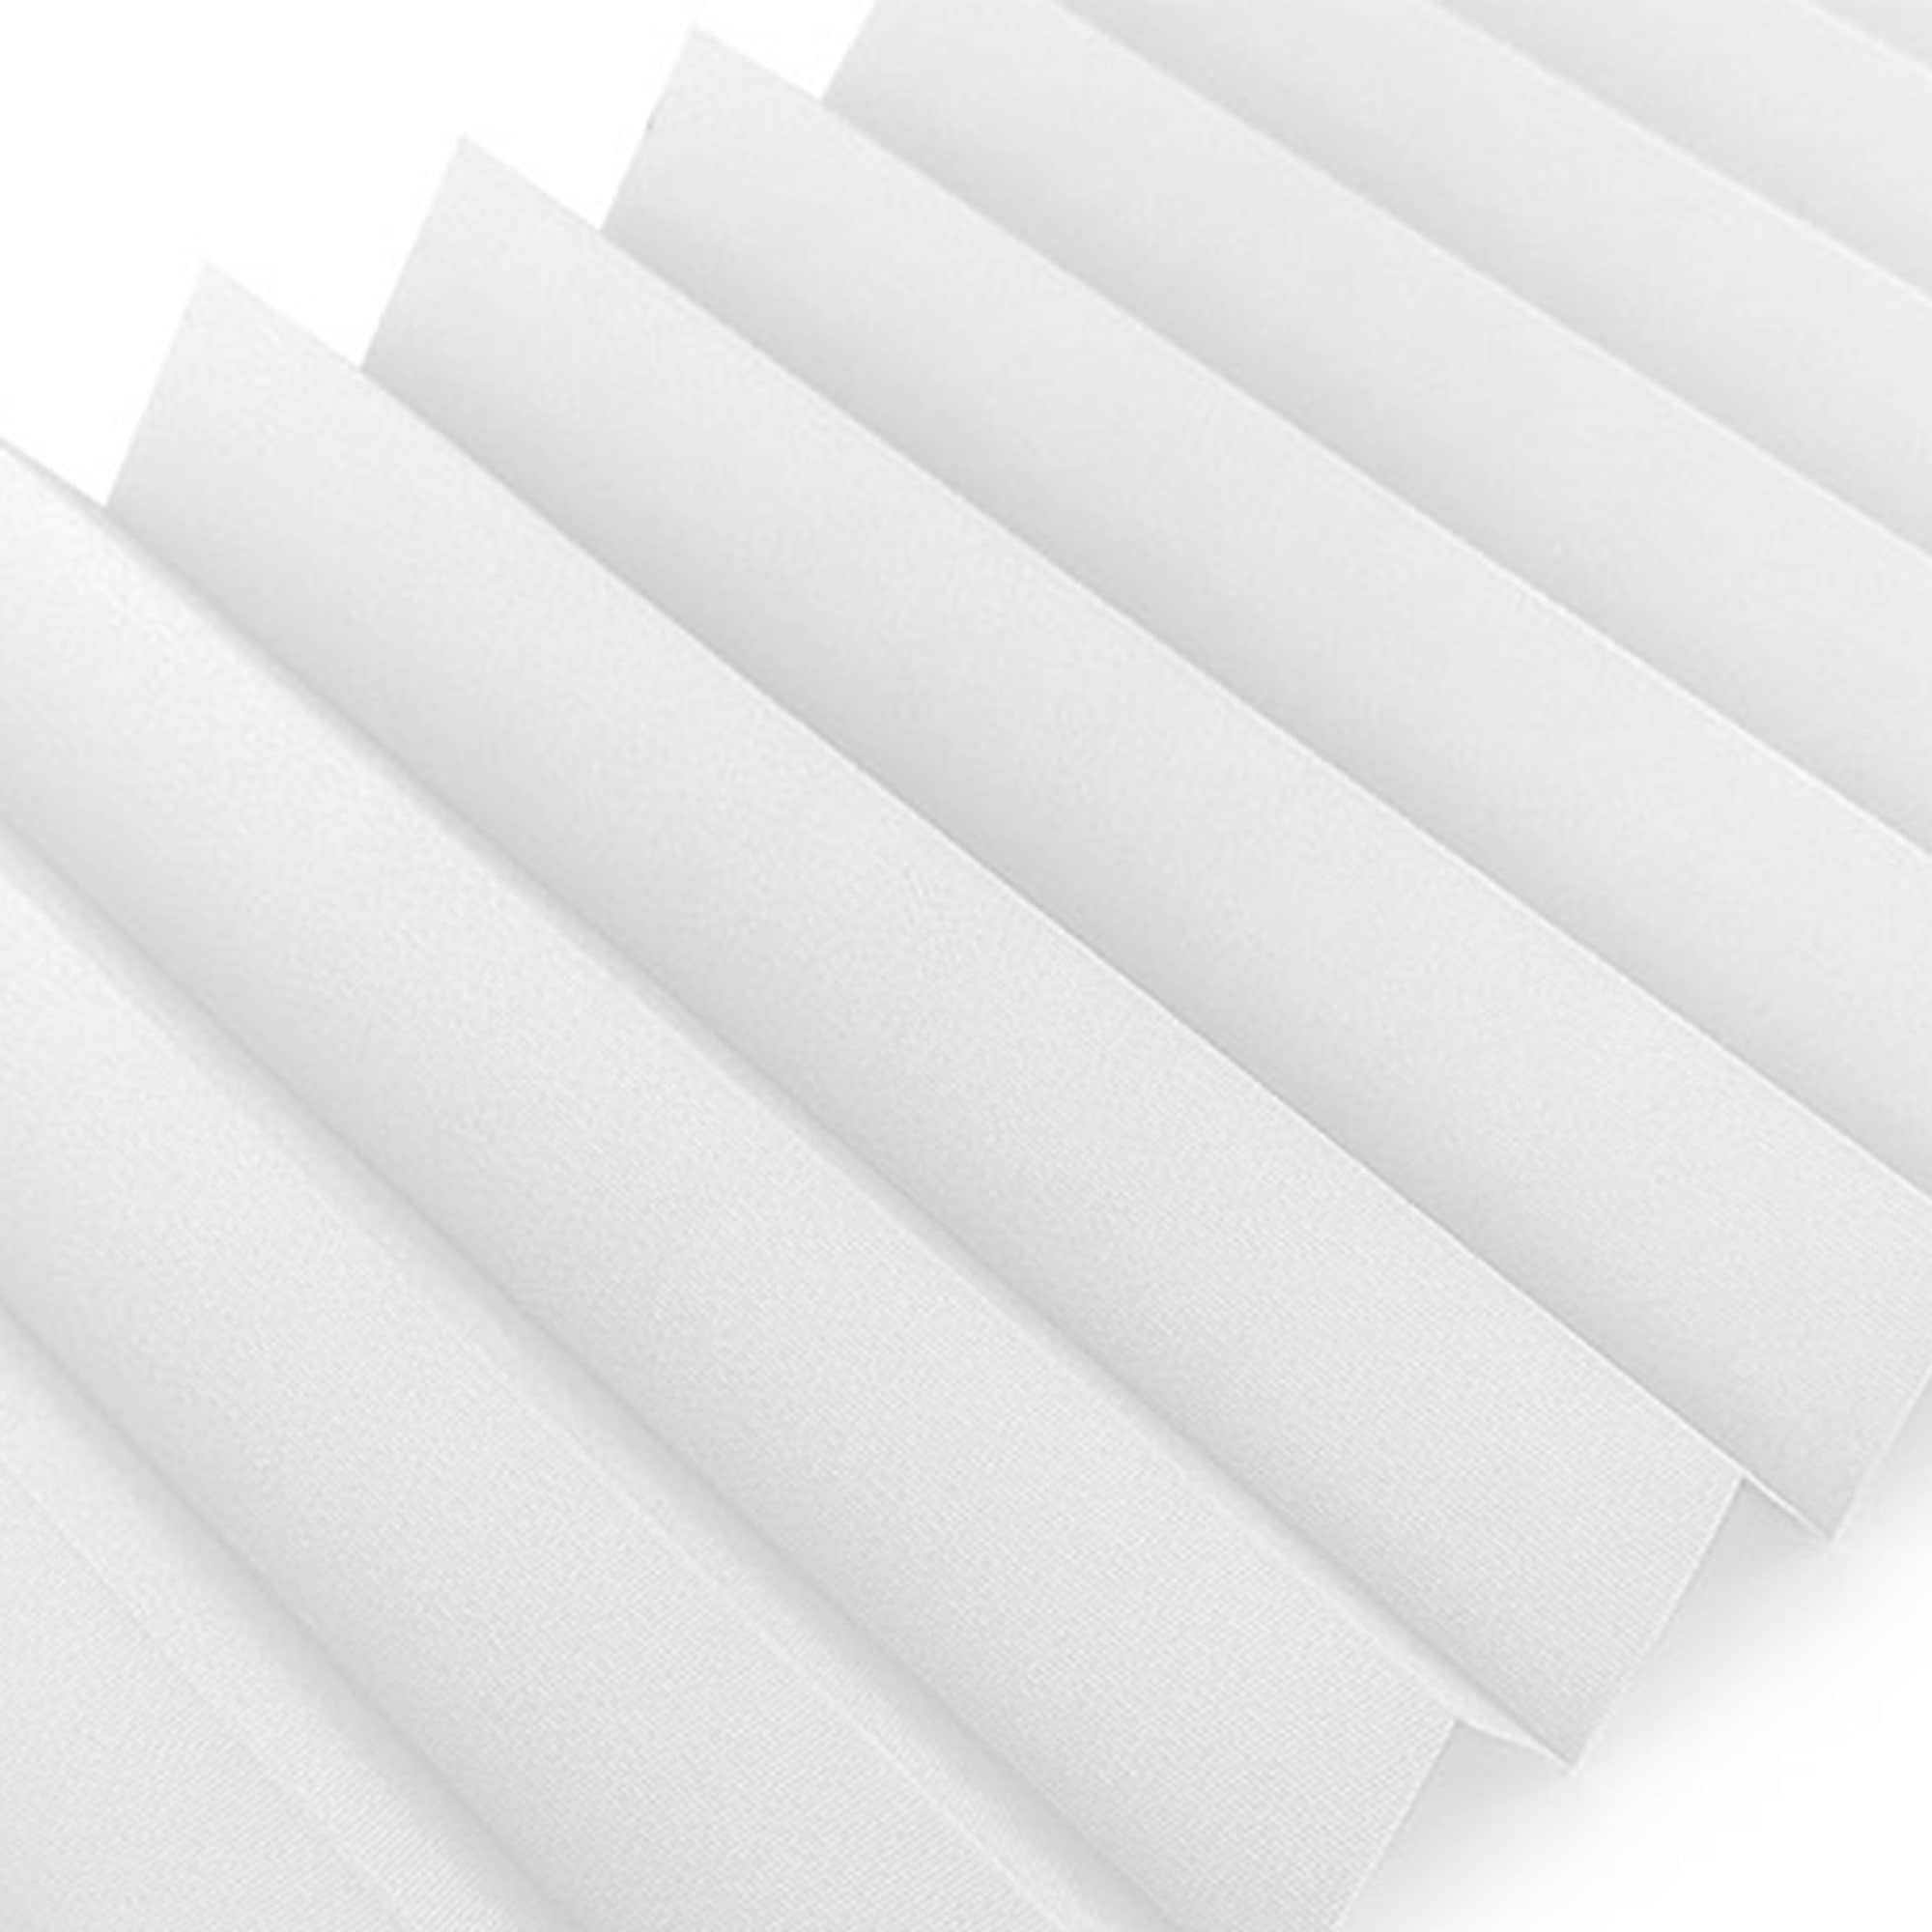 Klemmfix-Plissee-Faltrollo-ohne-Bohren-Fenster-Tuer-Plisseerollo-Plisee-Easyfix Indexbild 20